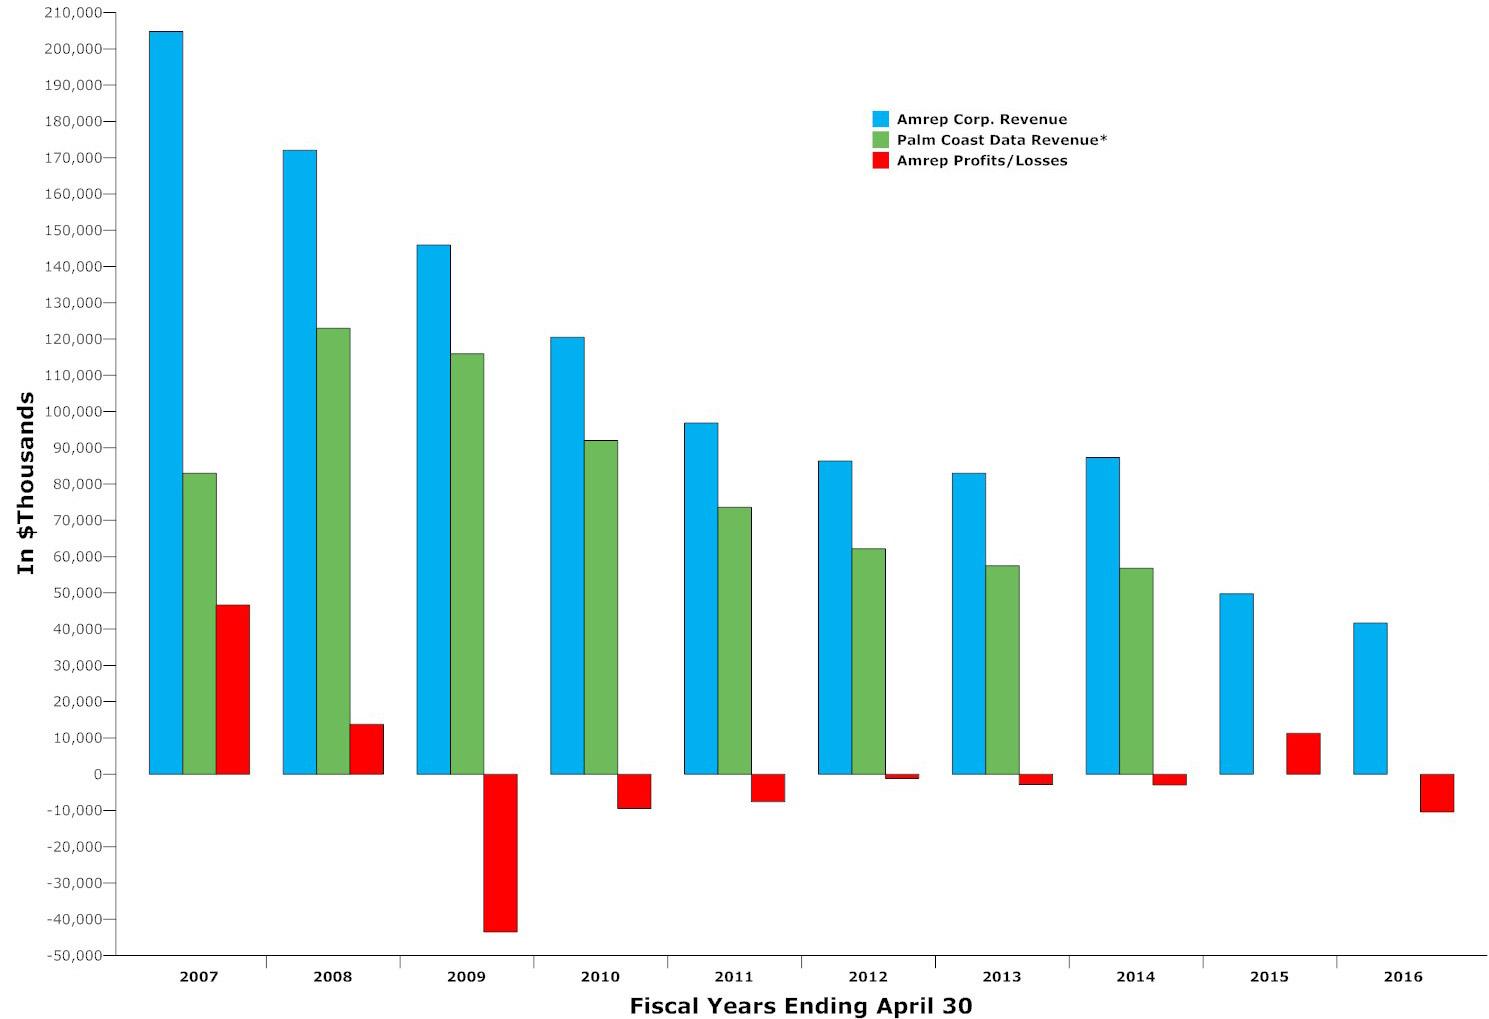 palm coast data 2016